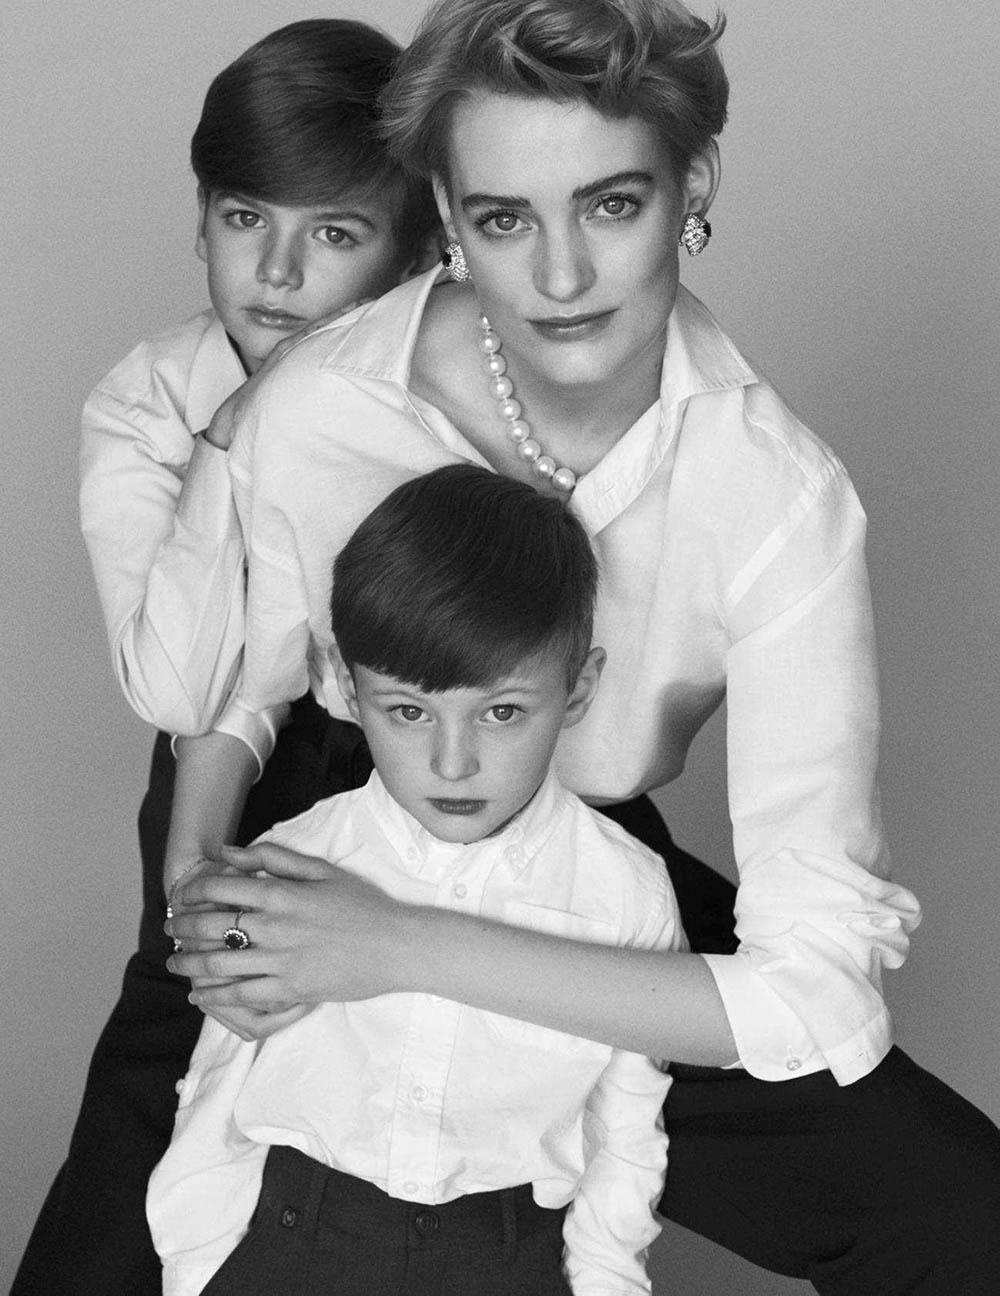 Sunniva Vaatevik by Alvaro Beamud for Vogue Spain April 2018